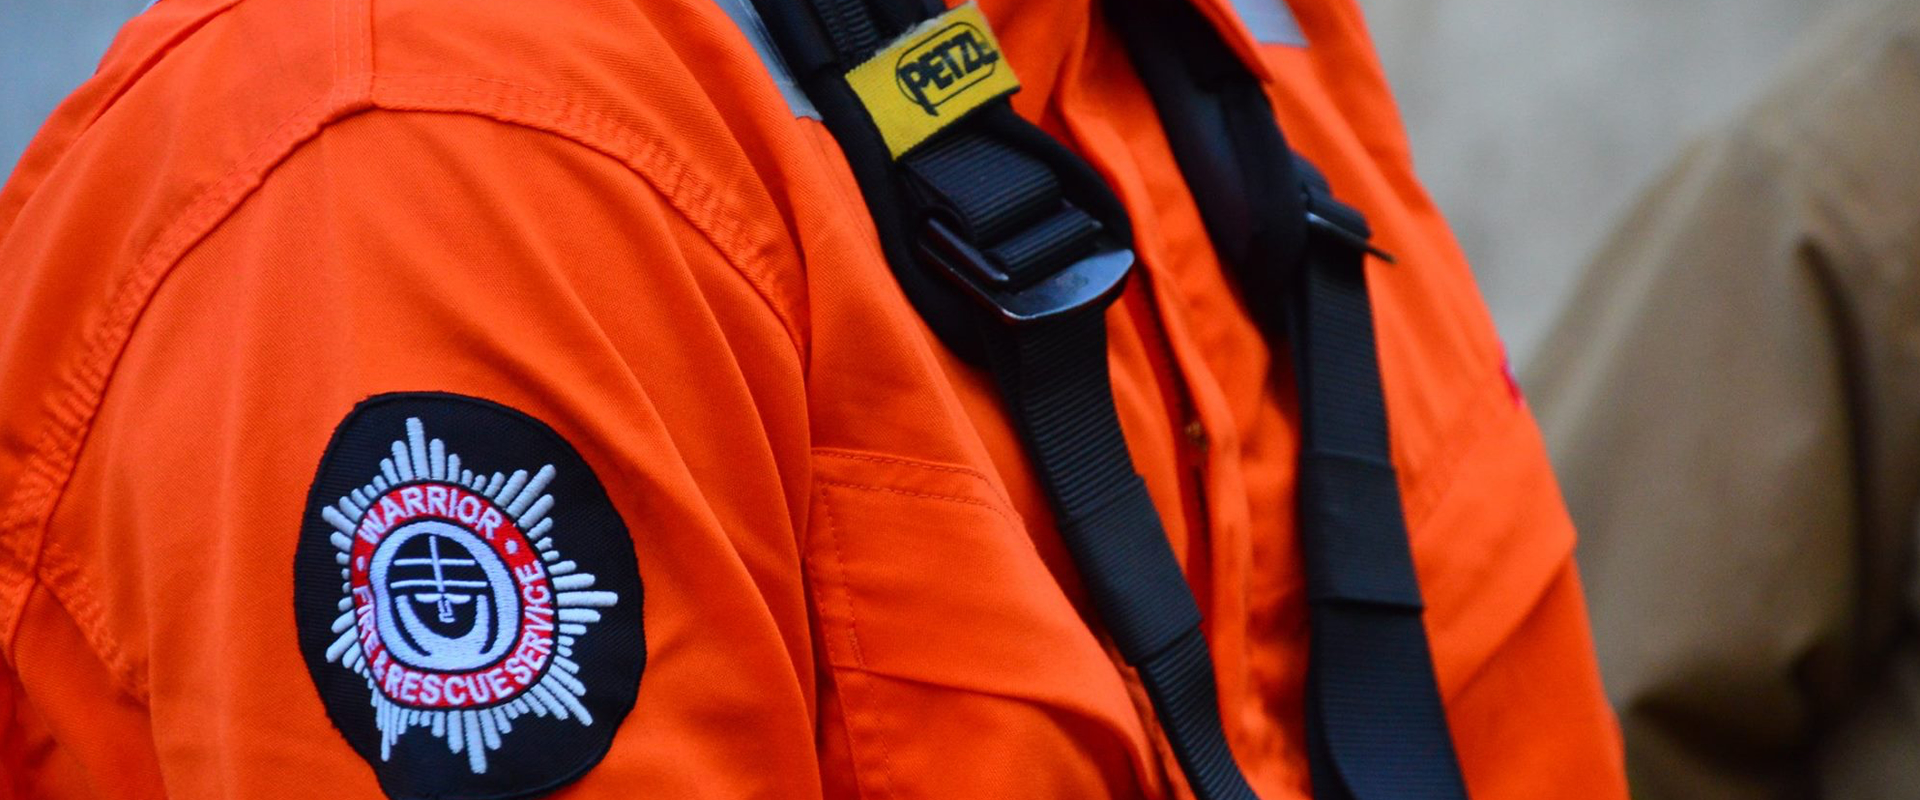 Fire & Rescue Service banner Image